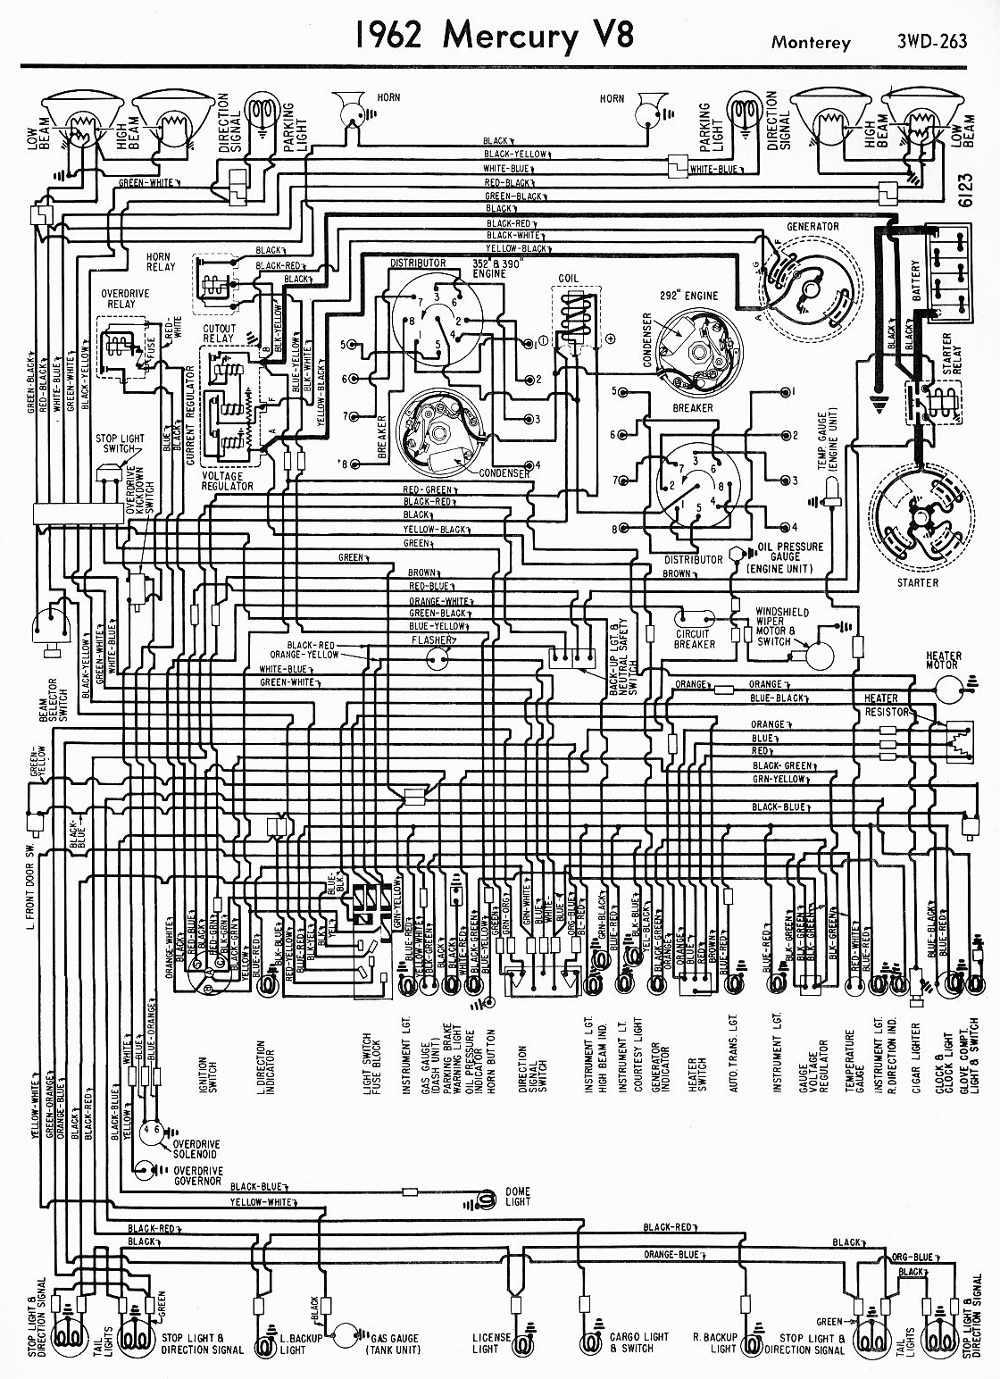 1964 mercury montclair wiring diagram 1967 mercury cougar wiring 1964 ford galaxie wiring diagram 1956 [ 1000 x 1379 Pixel ]